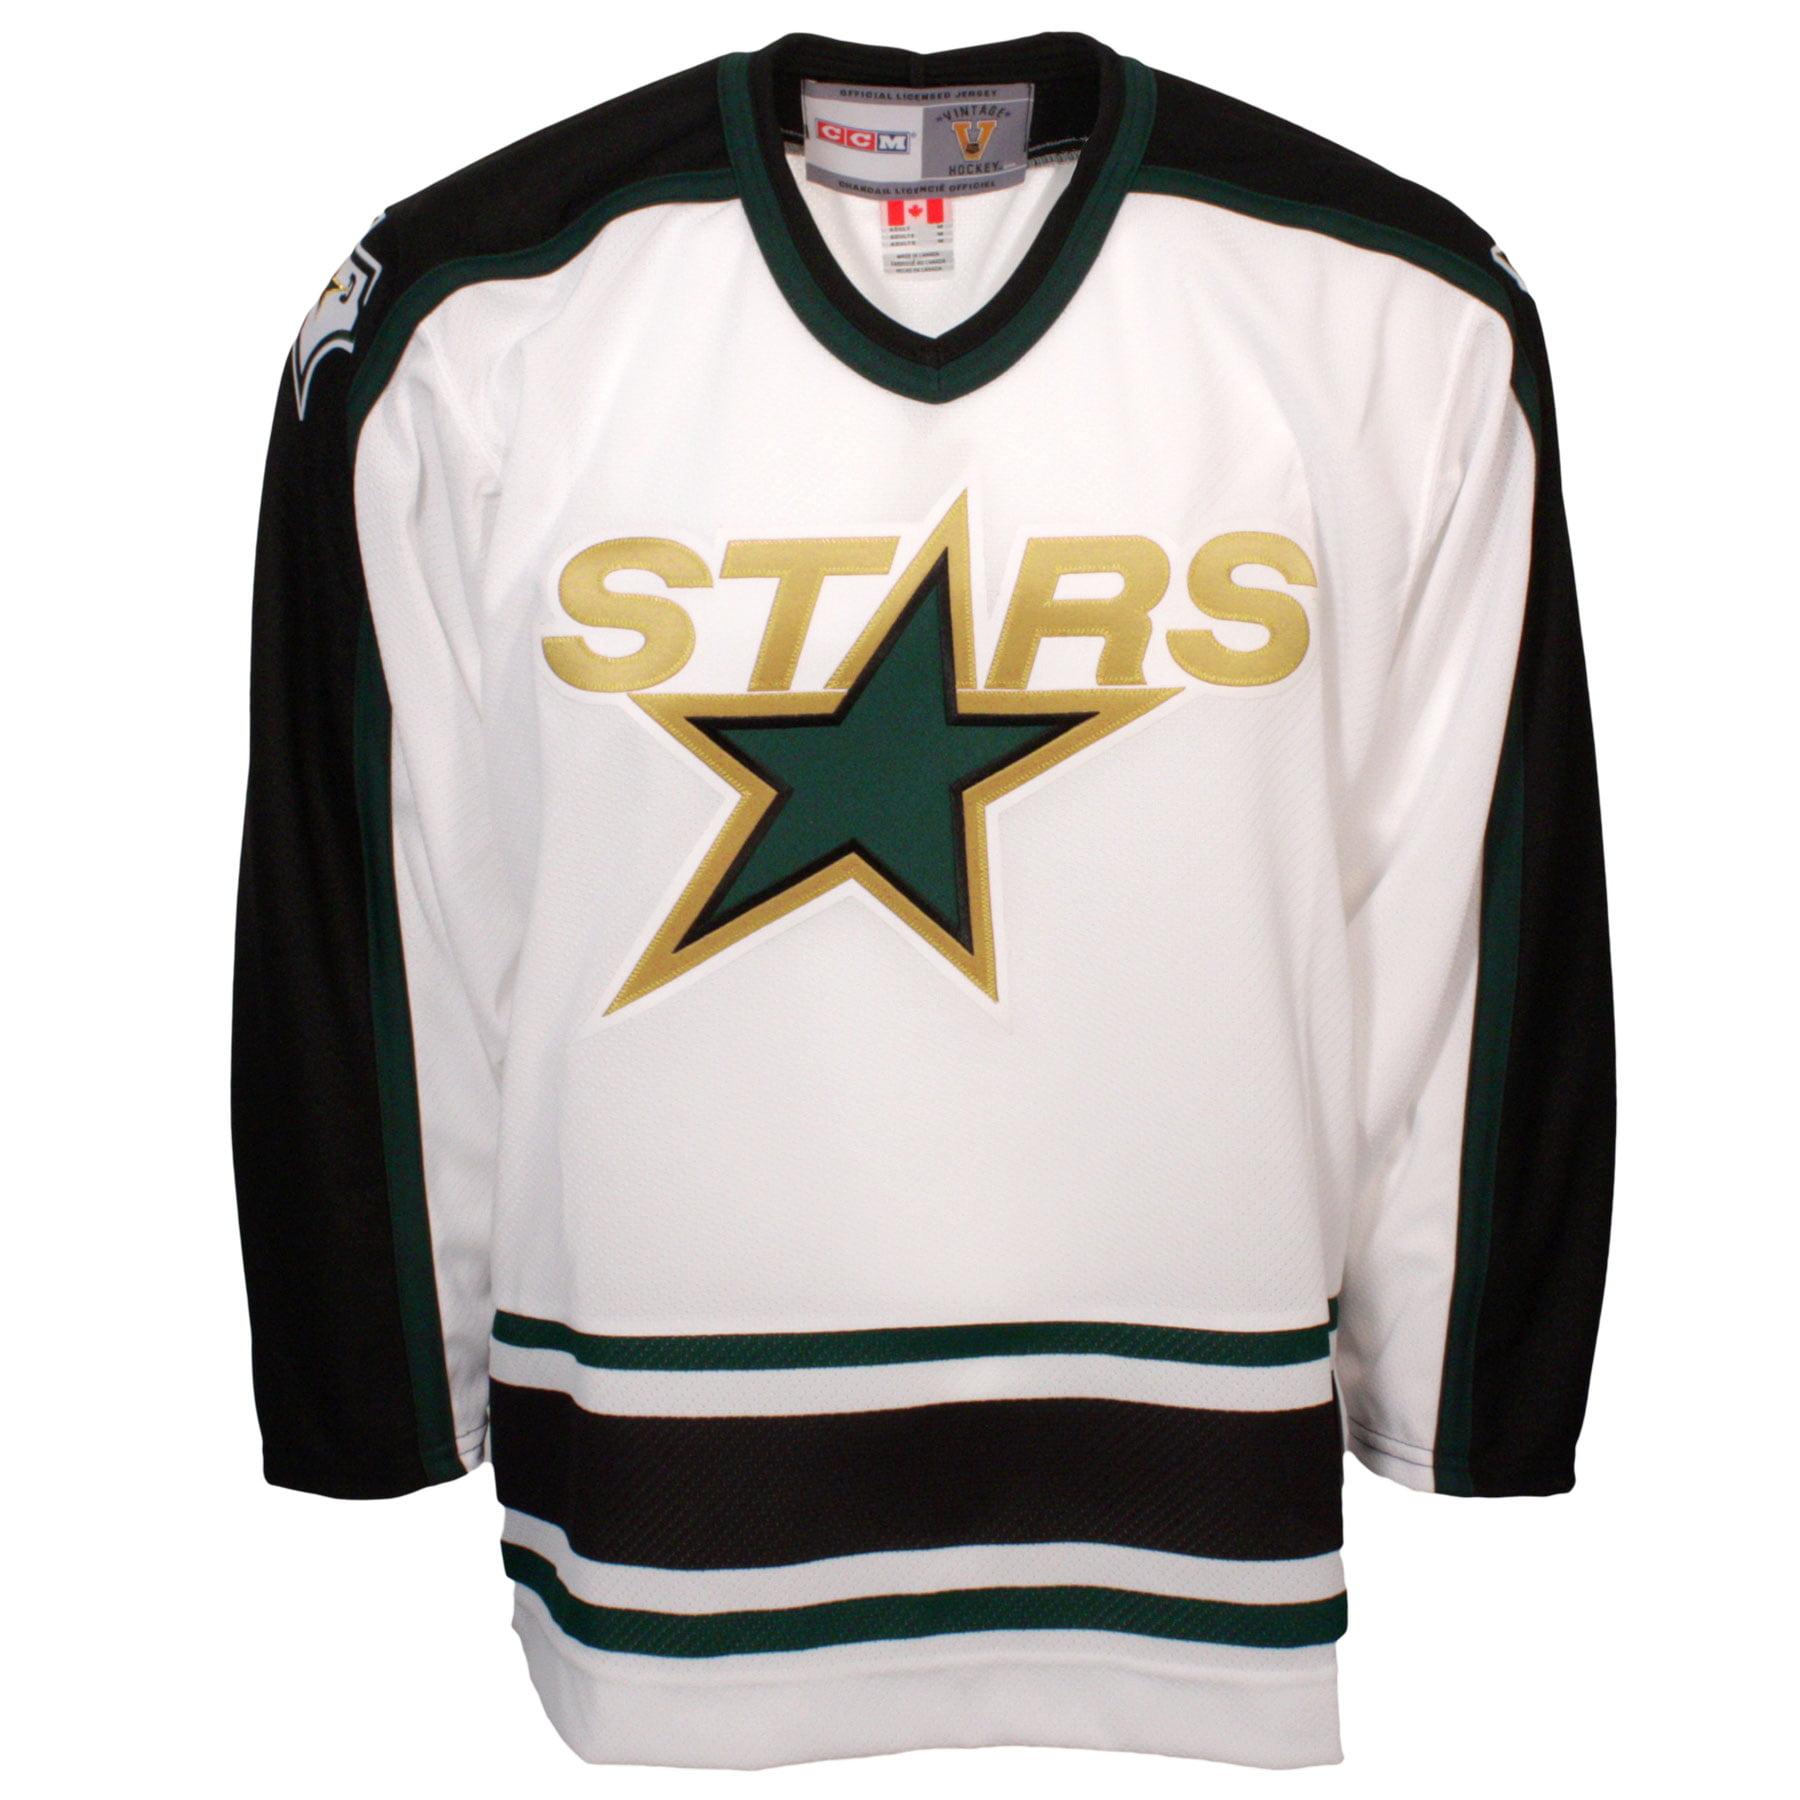 ccm dallas stars jersey